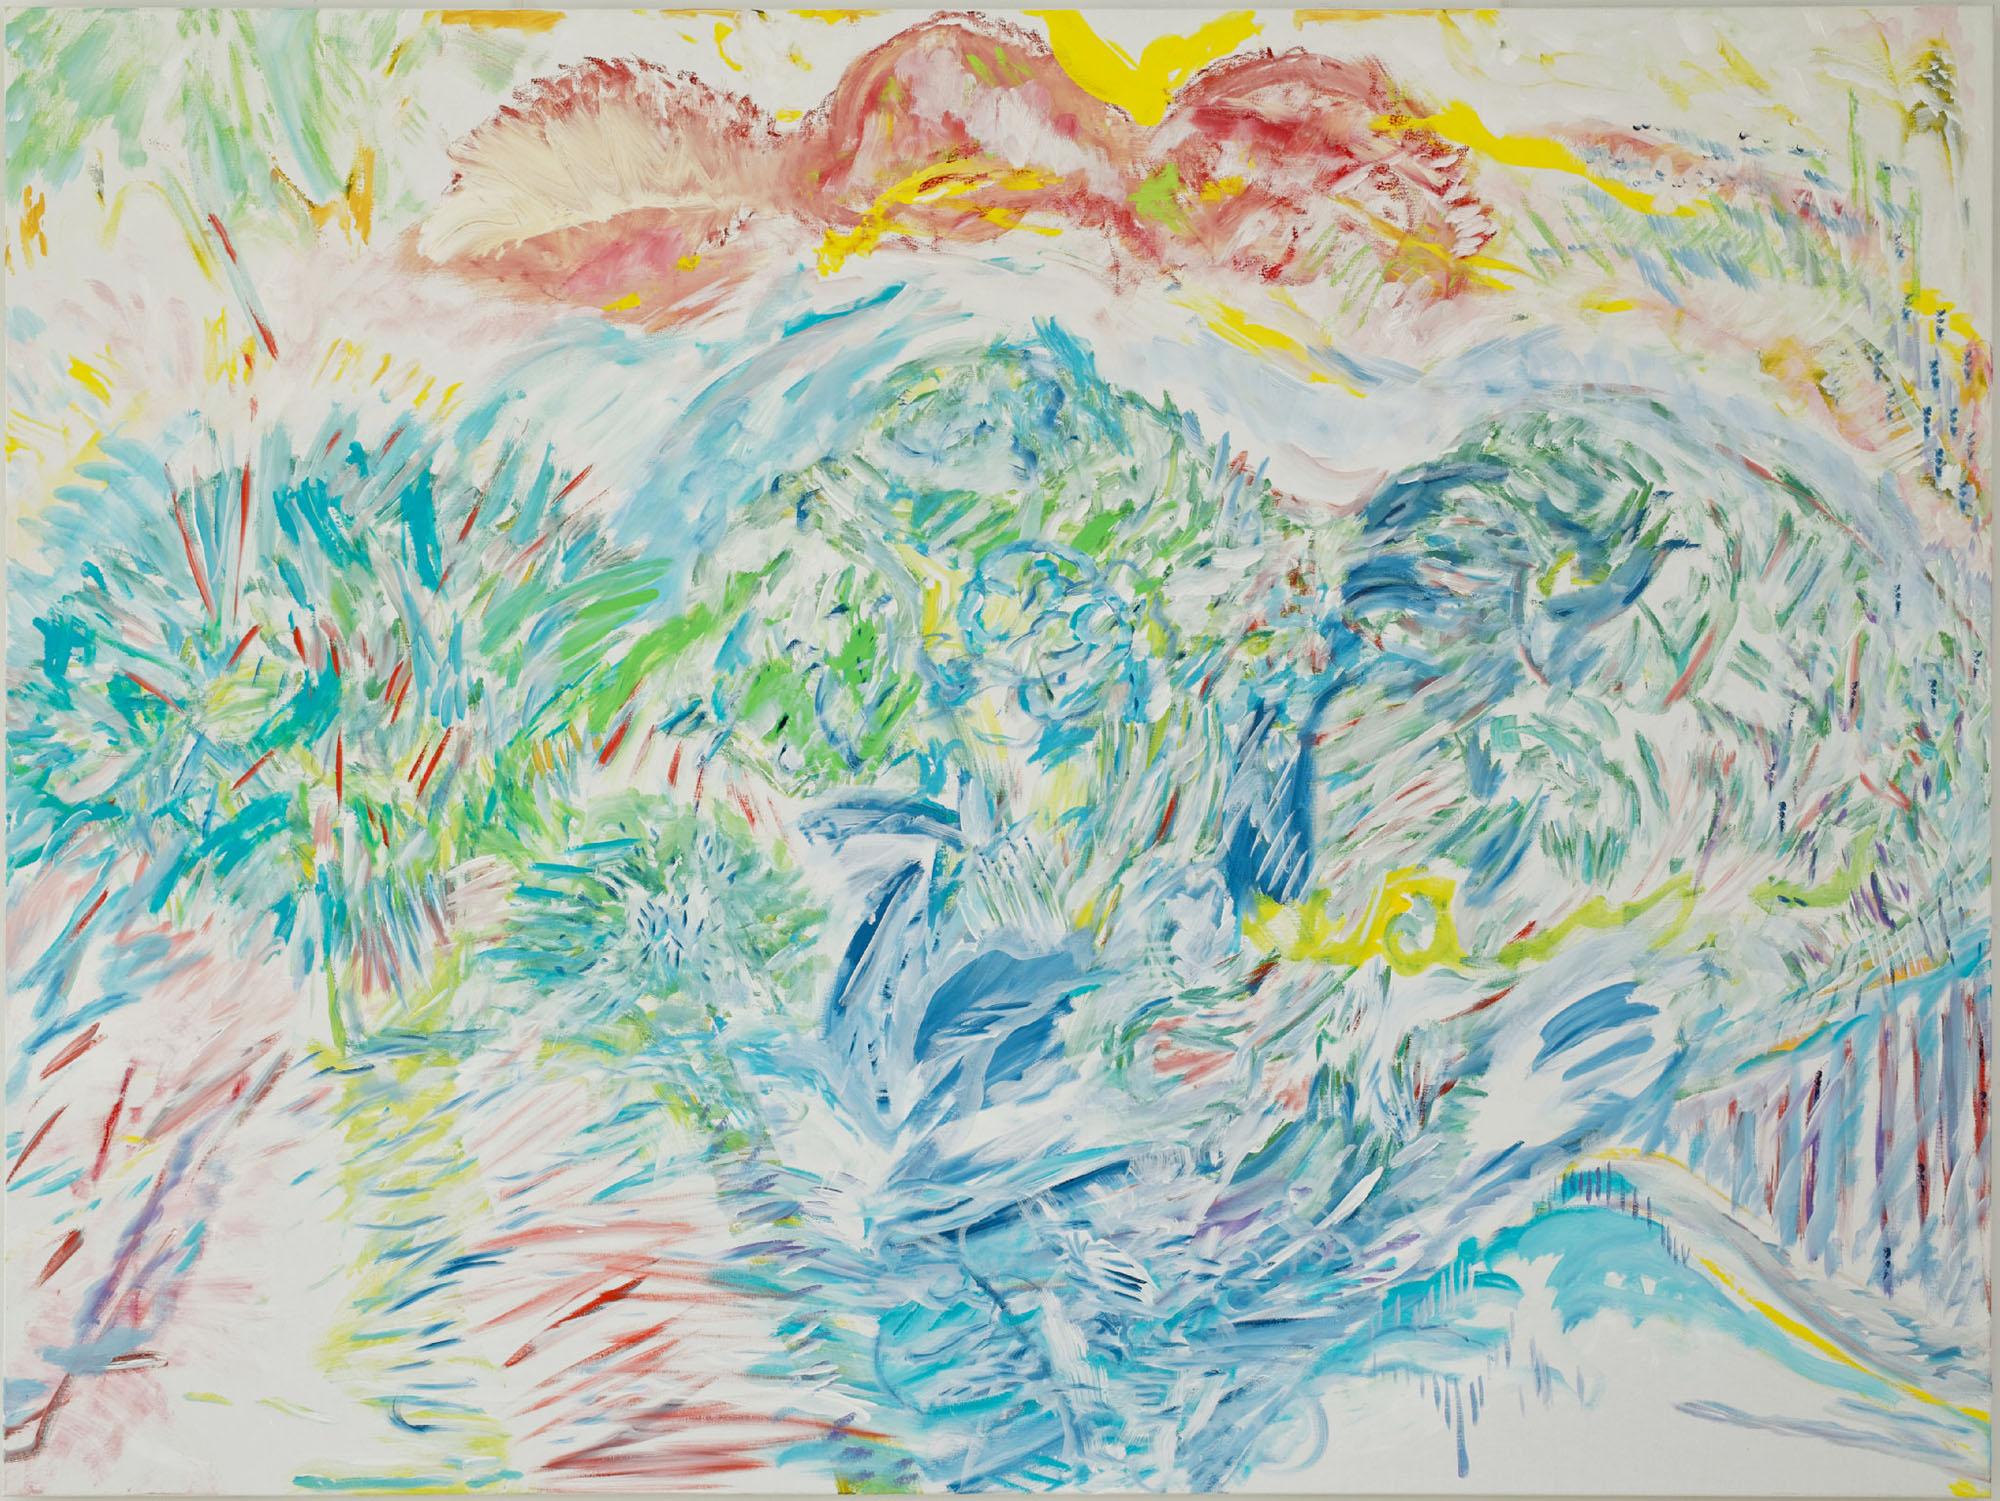 Rouge mis au vert (acrylic, pastel and pencil on canvas, 150 x 190 cm - 2013- 2015)